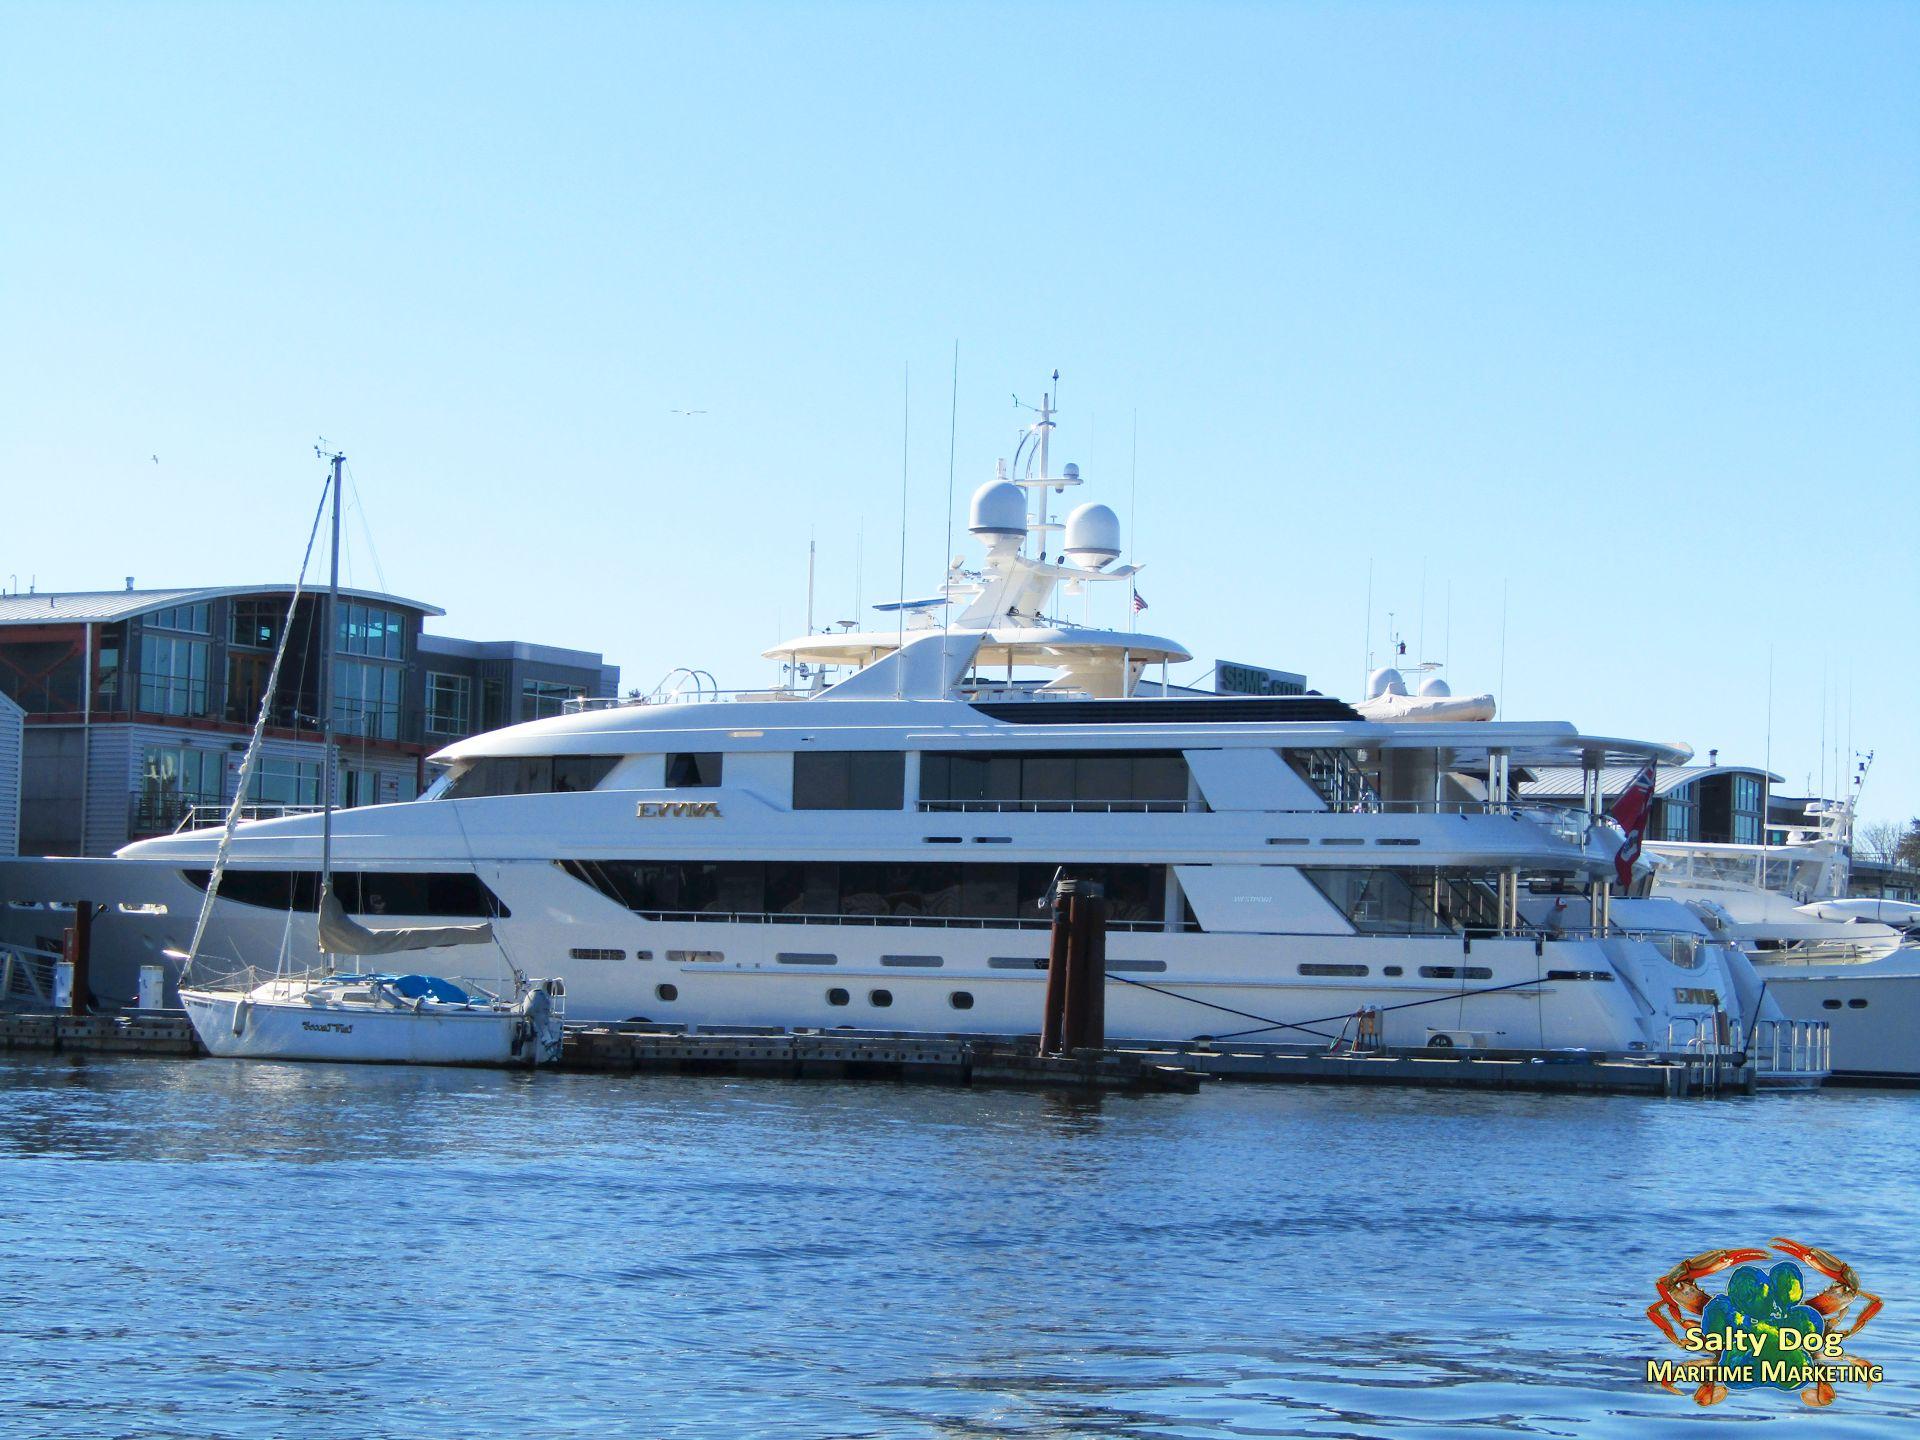 Evviva, Westport Superyacht, Seattle, PNW superyachts